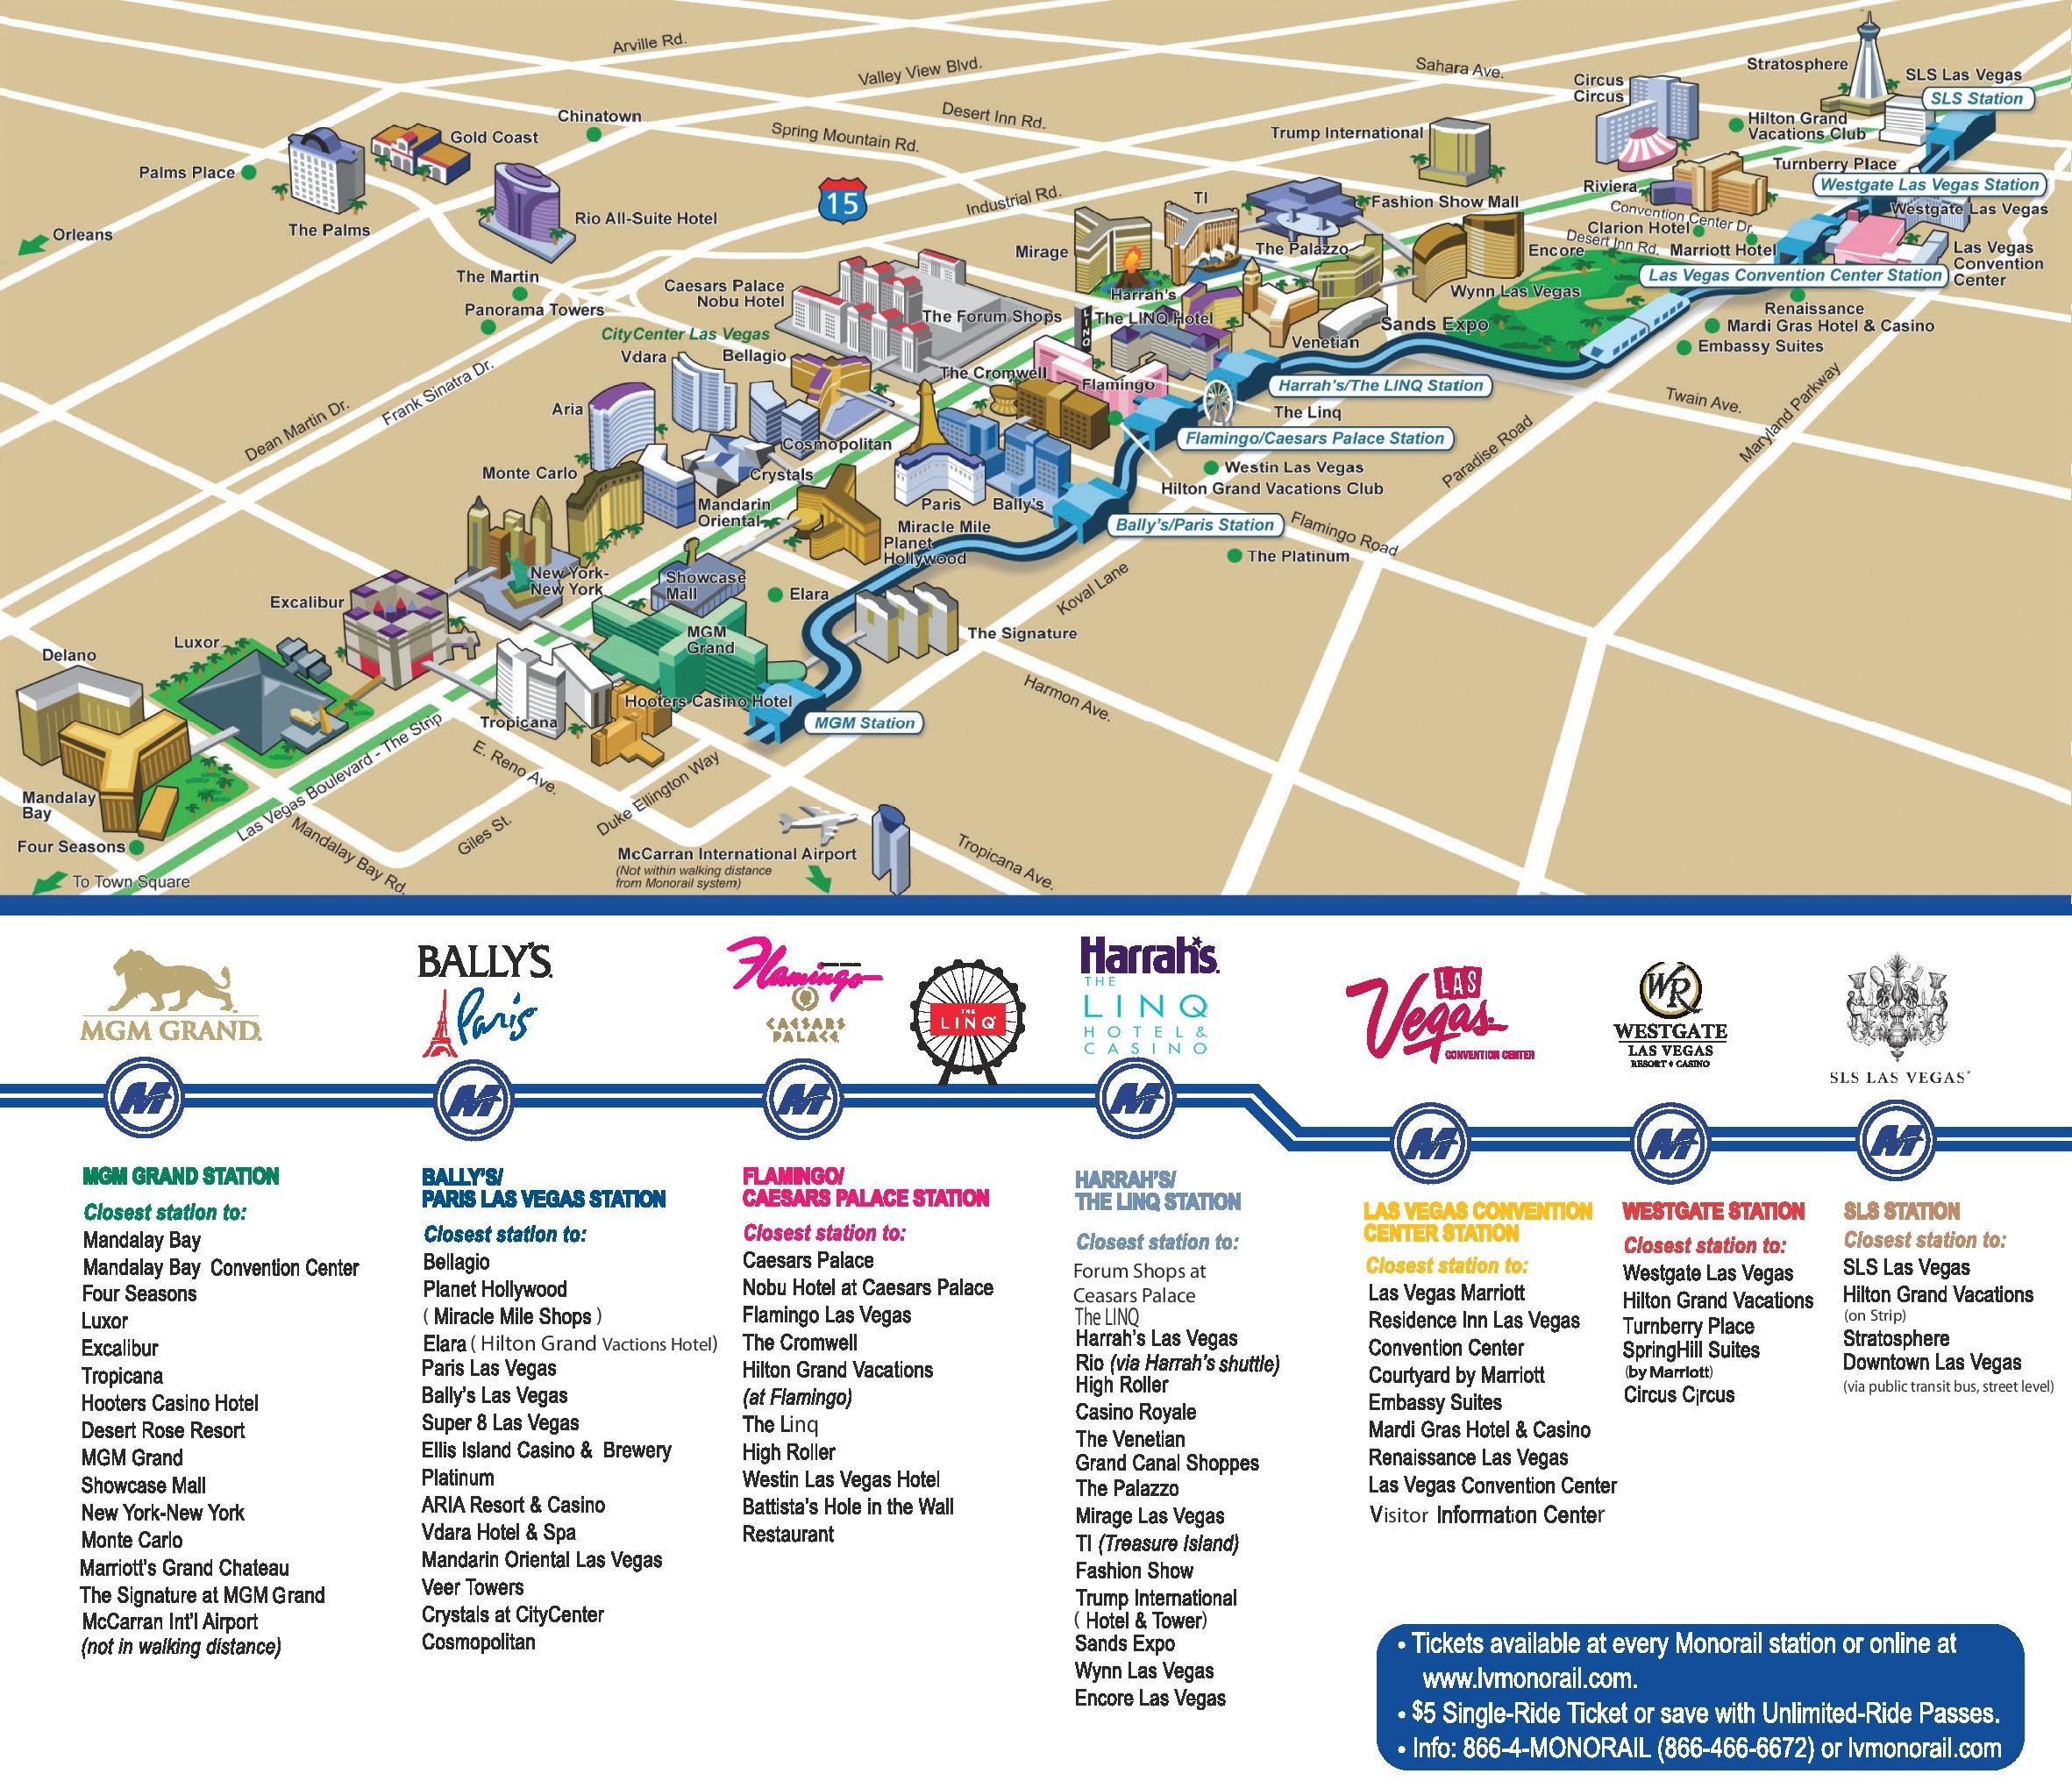 Las Vegas Strip Hotels And Casinos Map - Printable Map Of Las Vegas Strip